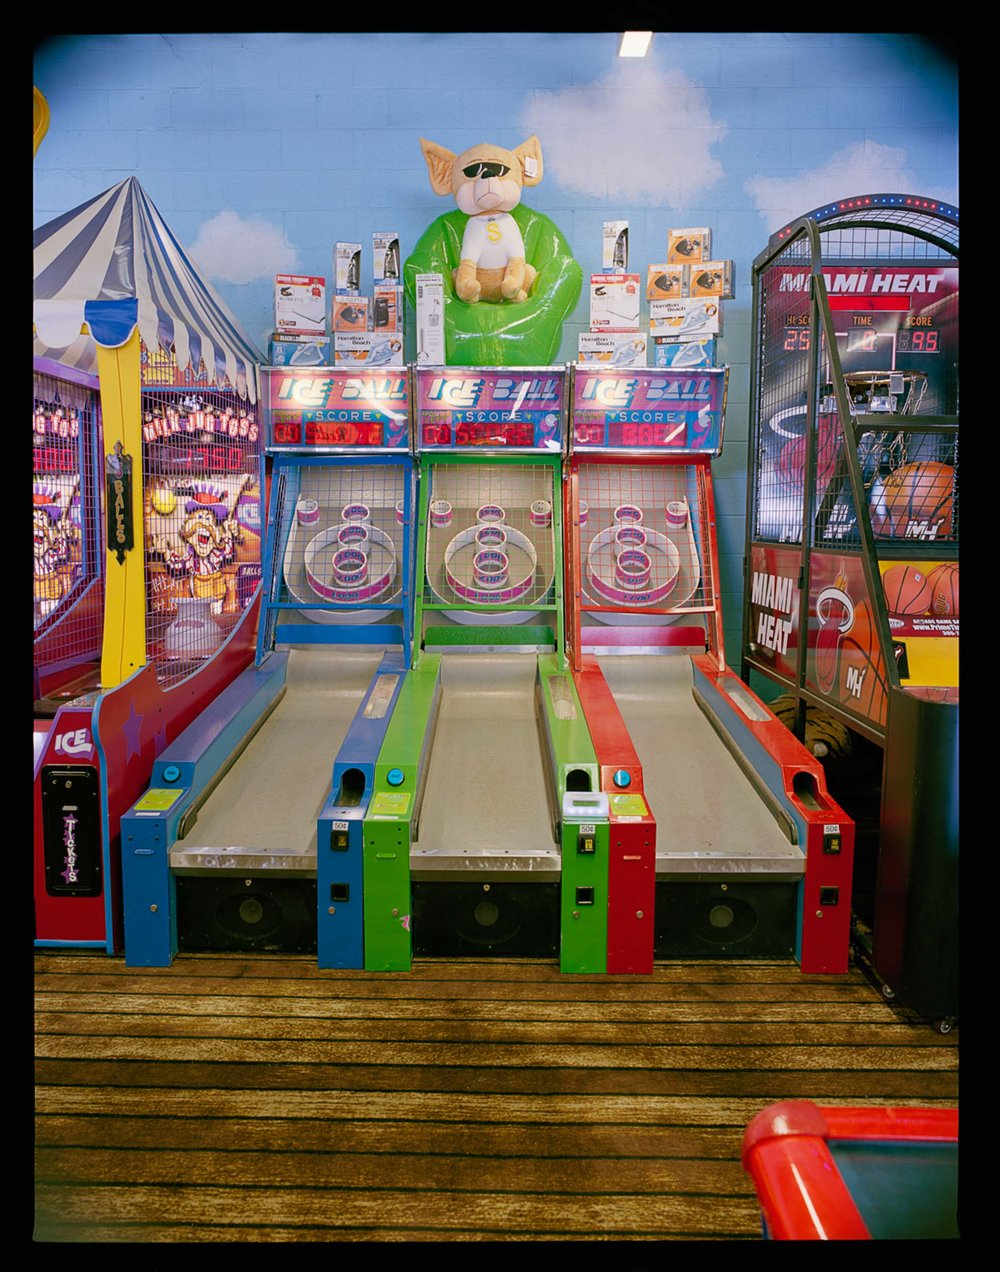 Shake Shoppe Arcade #2, Seaside, NJ. 2014. Mamiya RZ67.